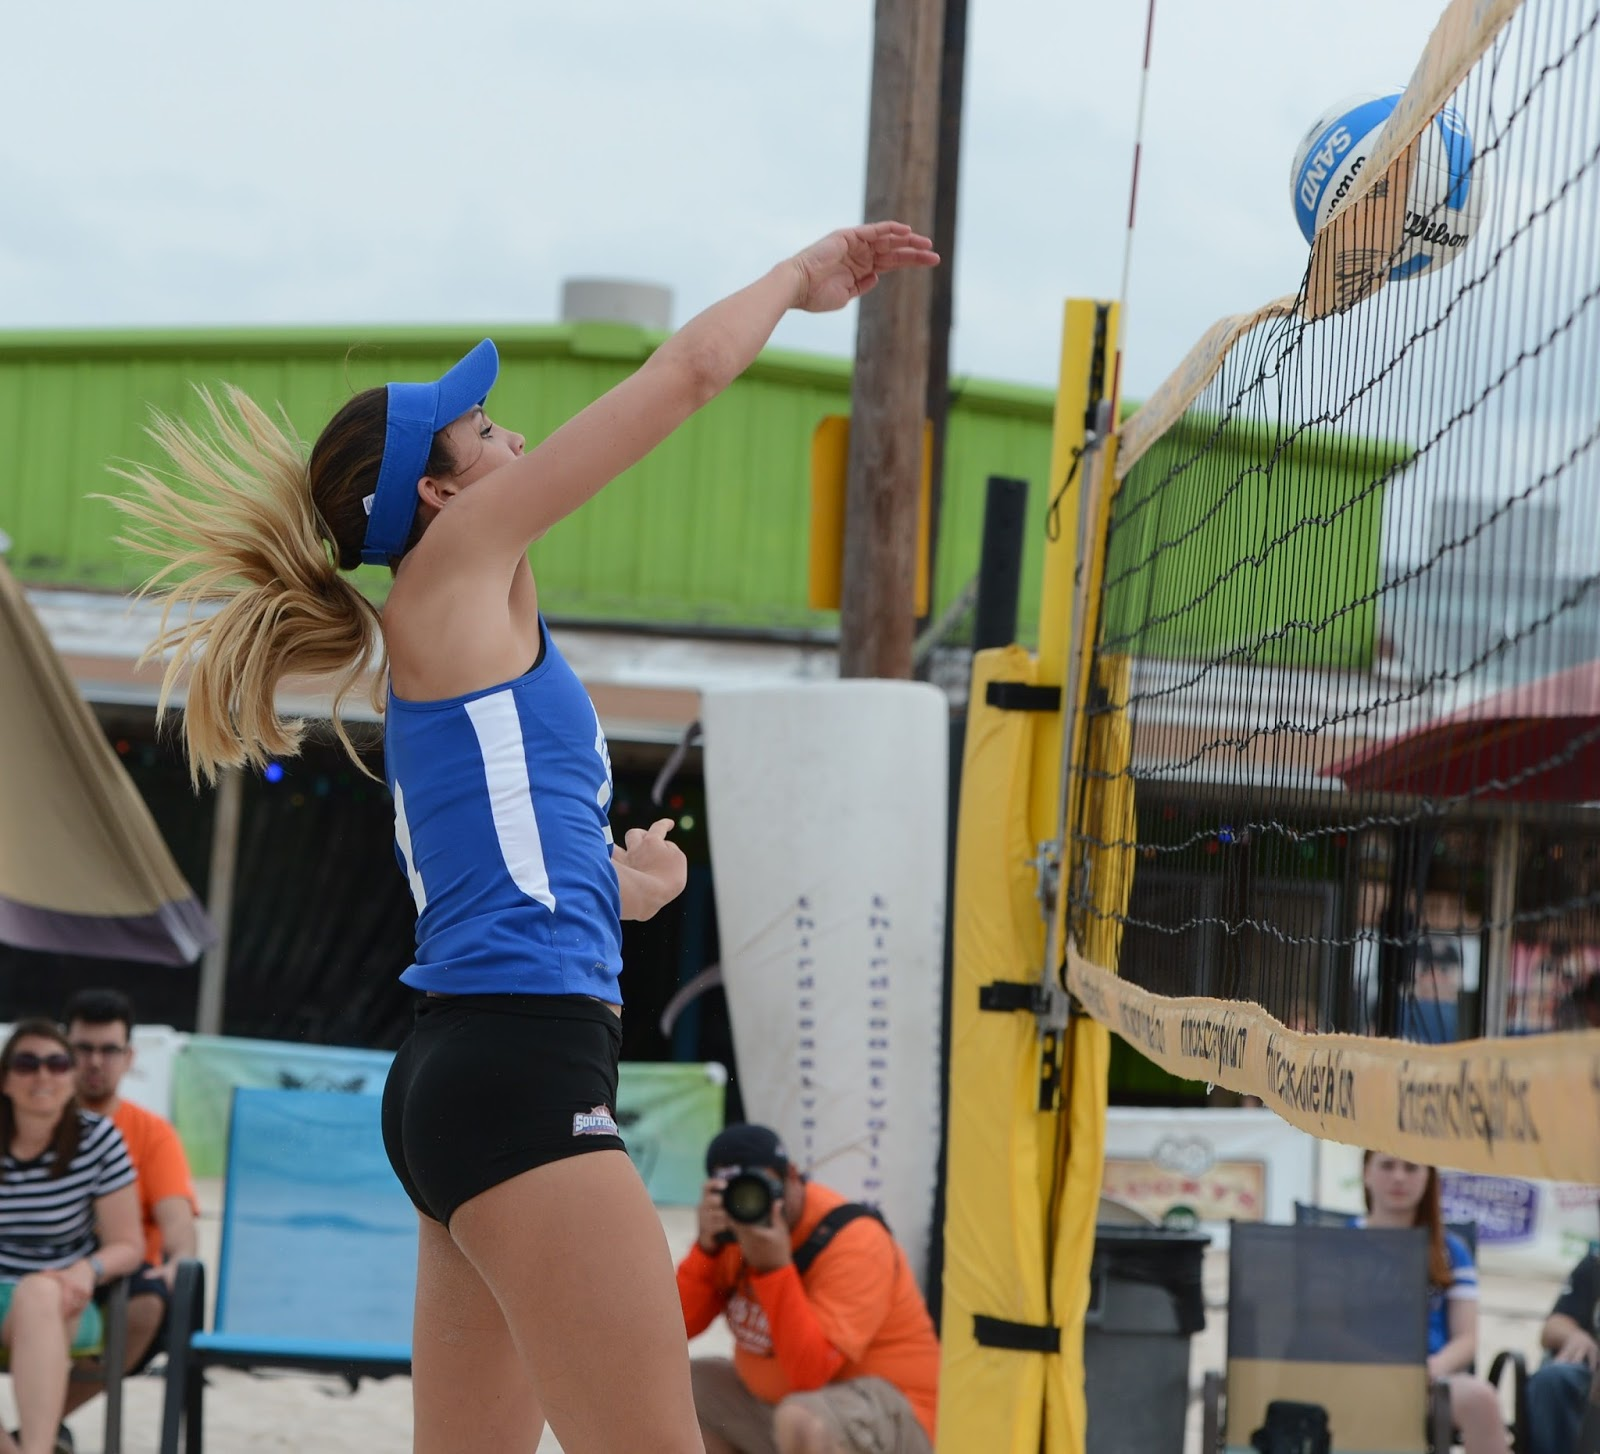 Texsport Publications Hbu Takes Inaugural Beach Volleyball Match 3 2 Over Texas A M Corpus Christi